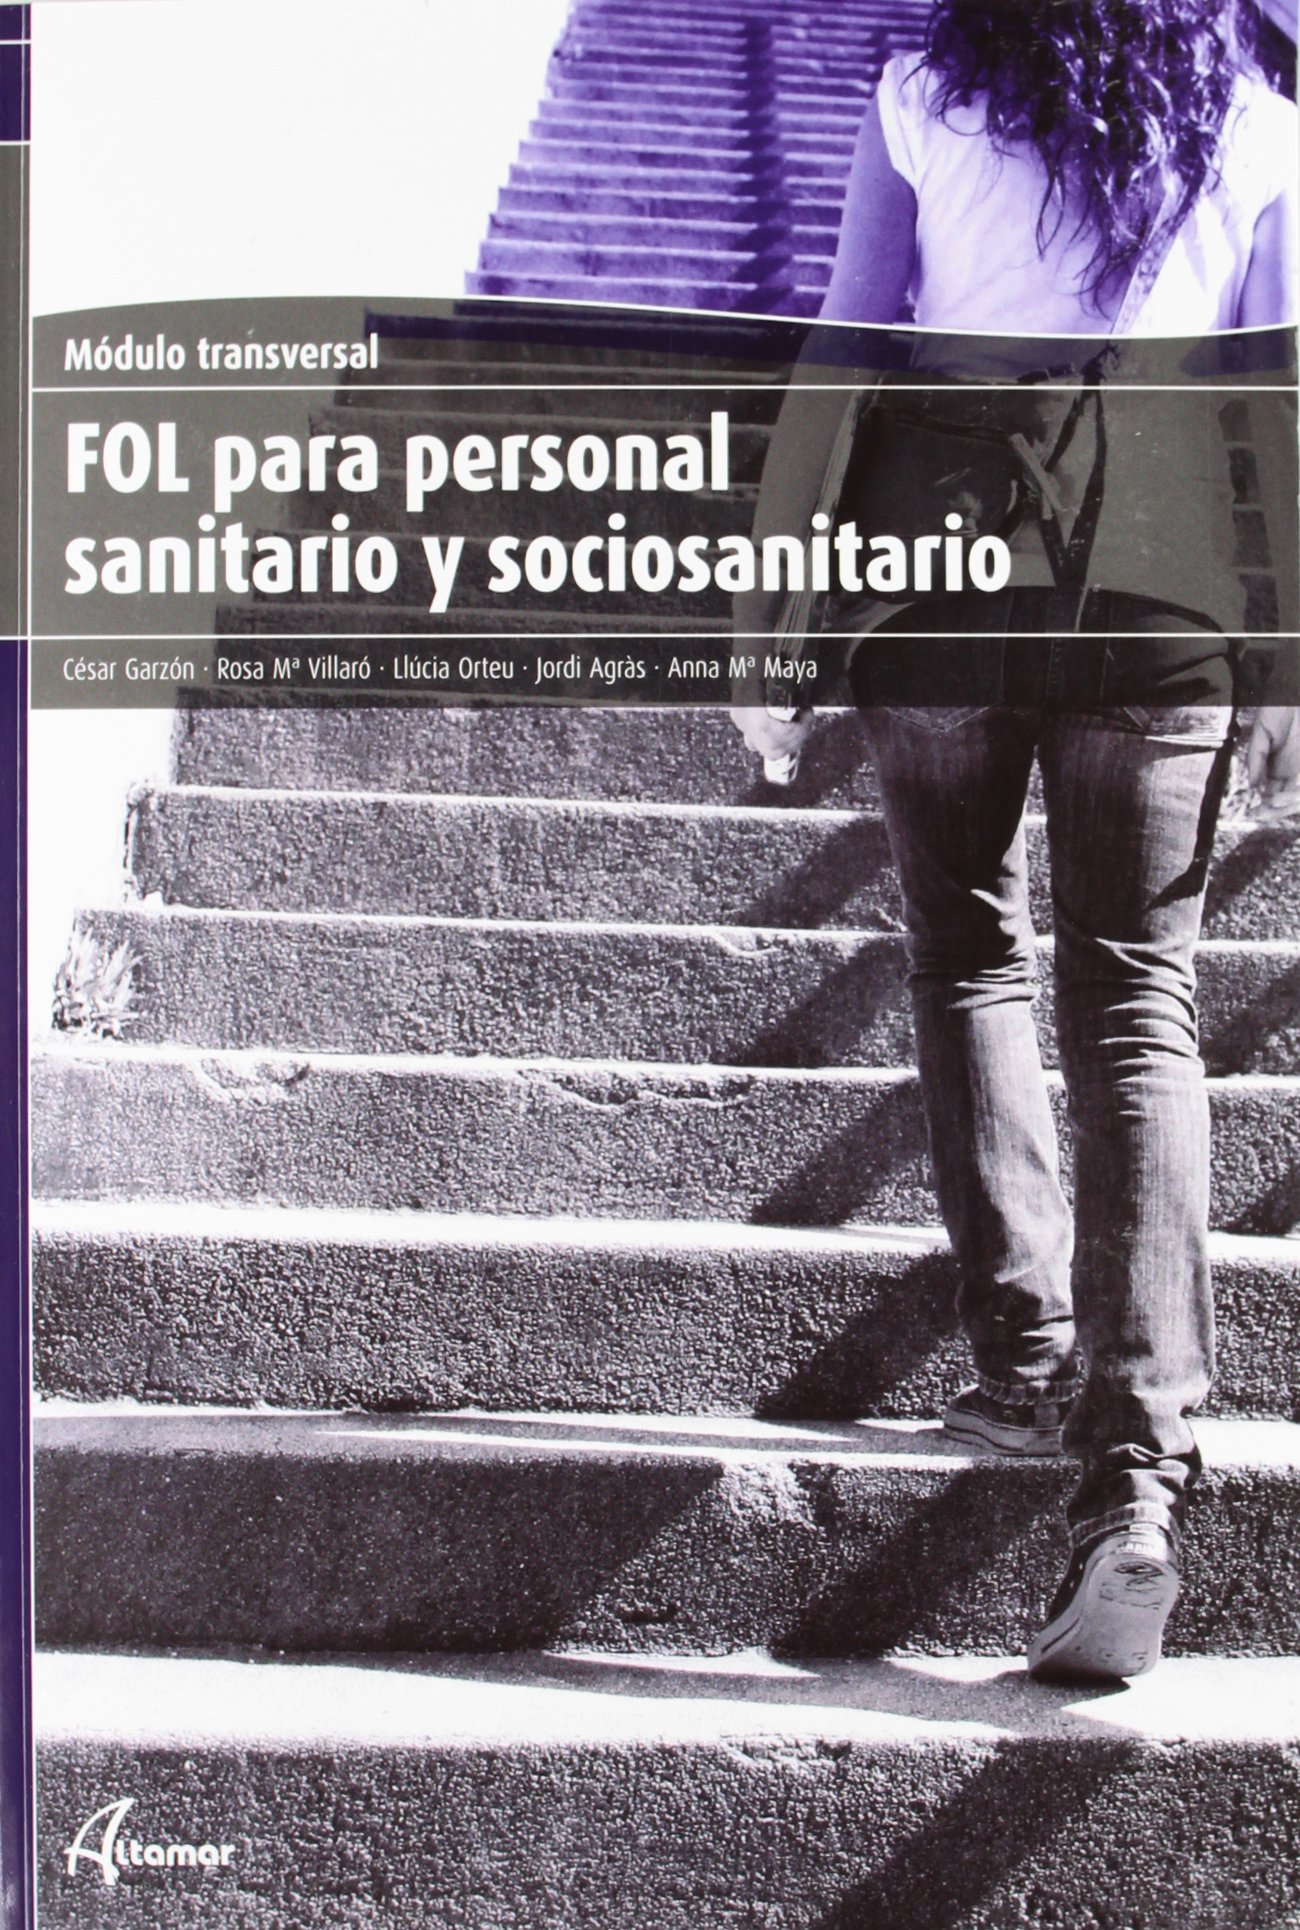 FOL para profesionales sanitarios y sociosanitarios (Spanish) Paperback – June 1, 2011